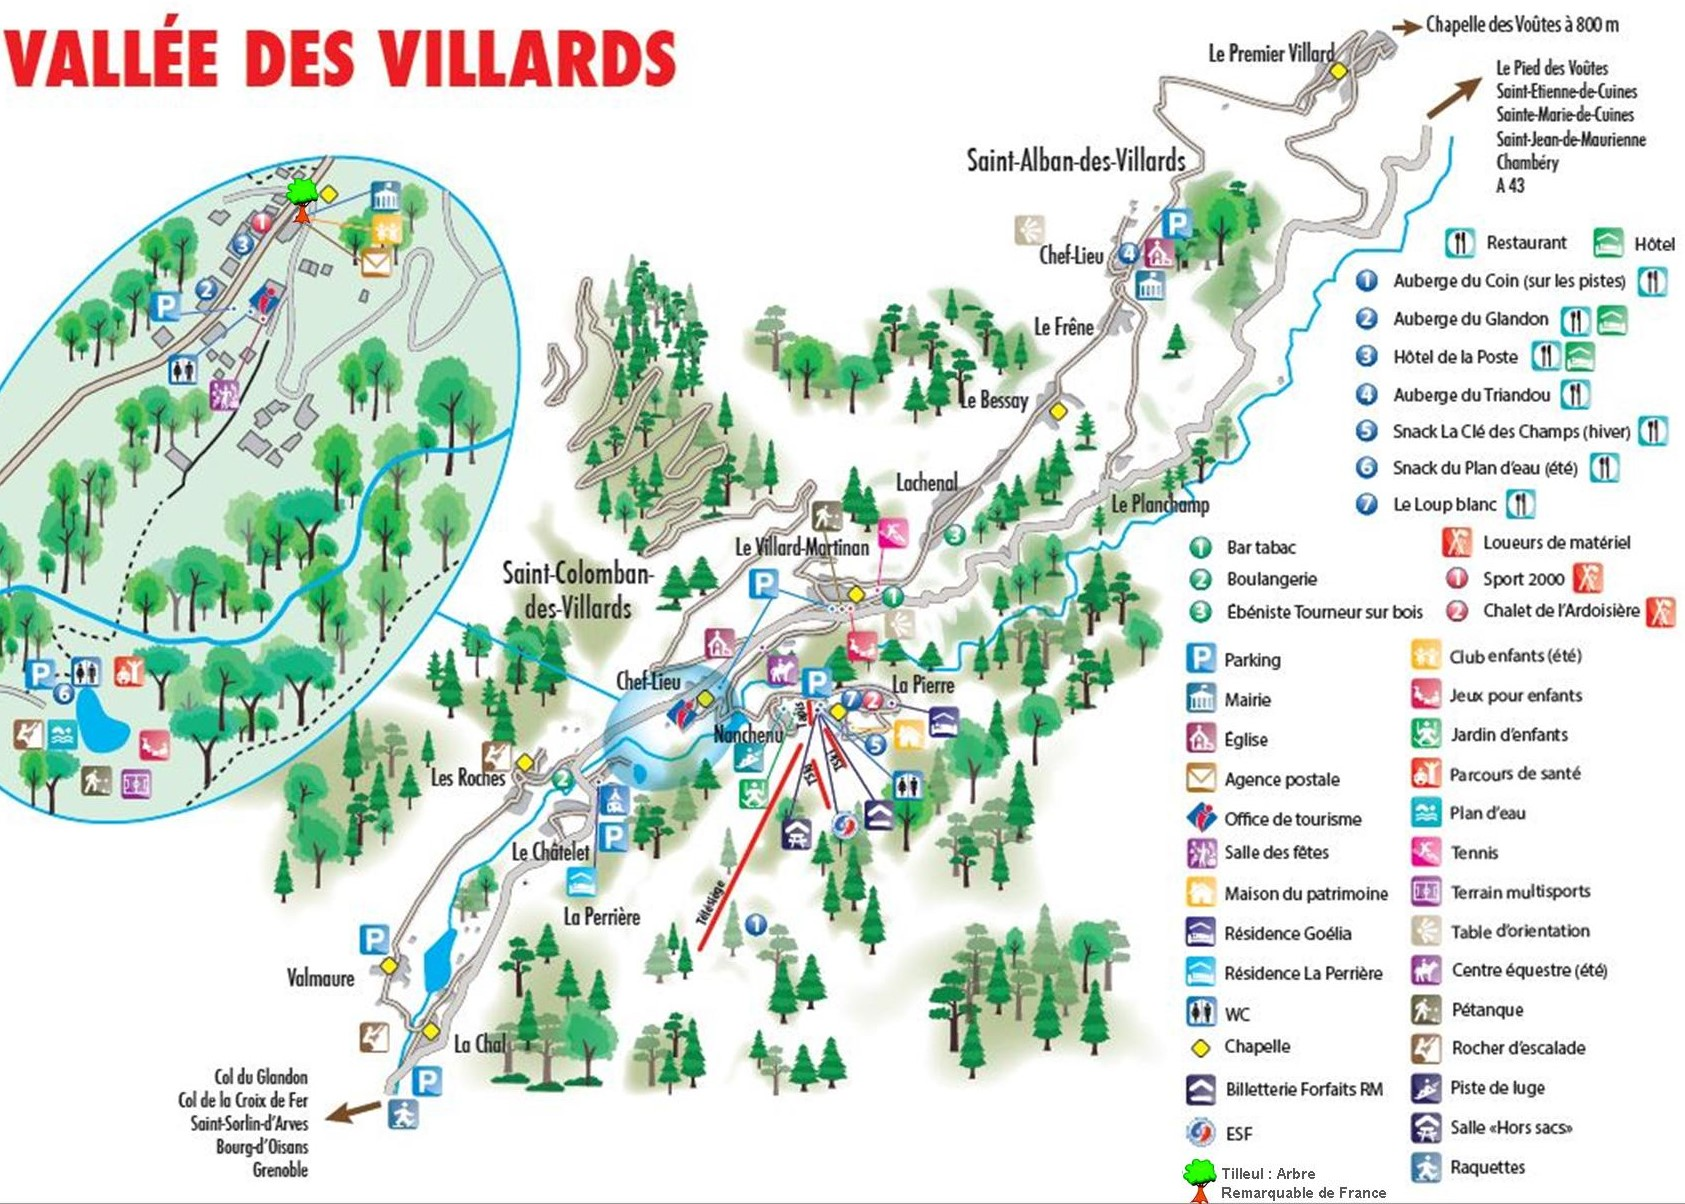 carte-touristique-vallee-des-villards-404